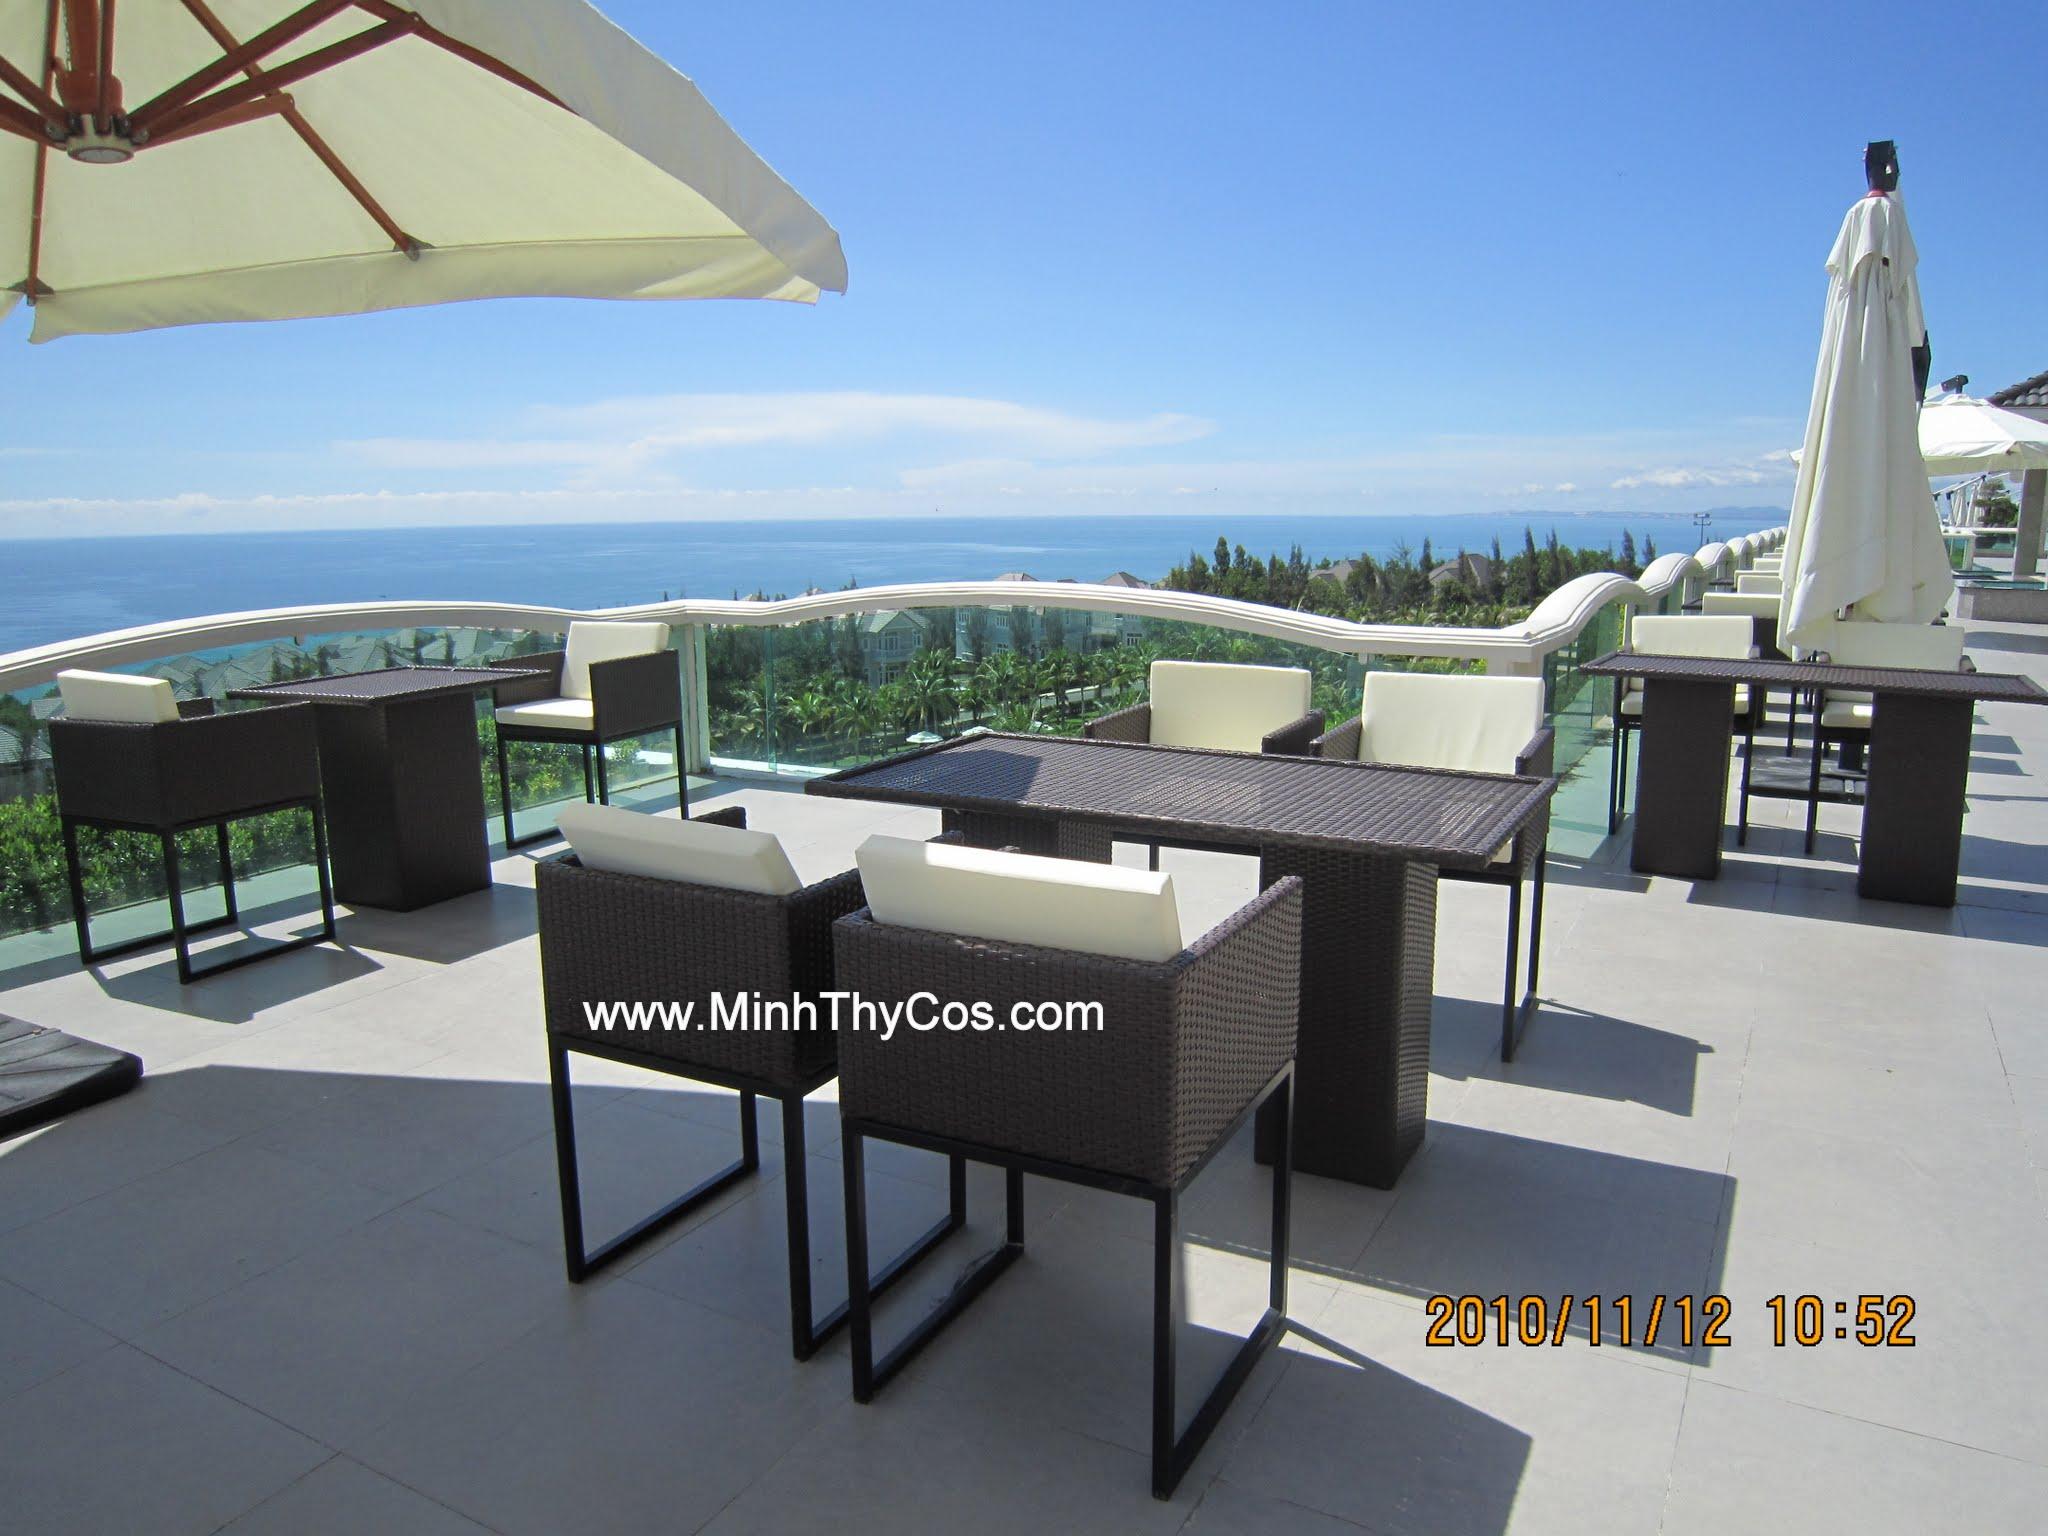 Outdoor wicker dining set sEALINK Phan Thiet